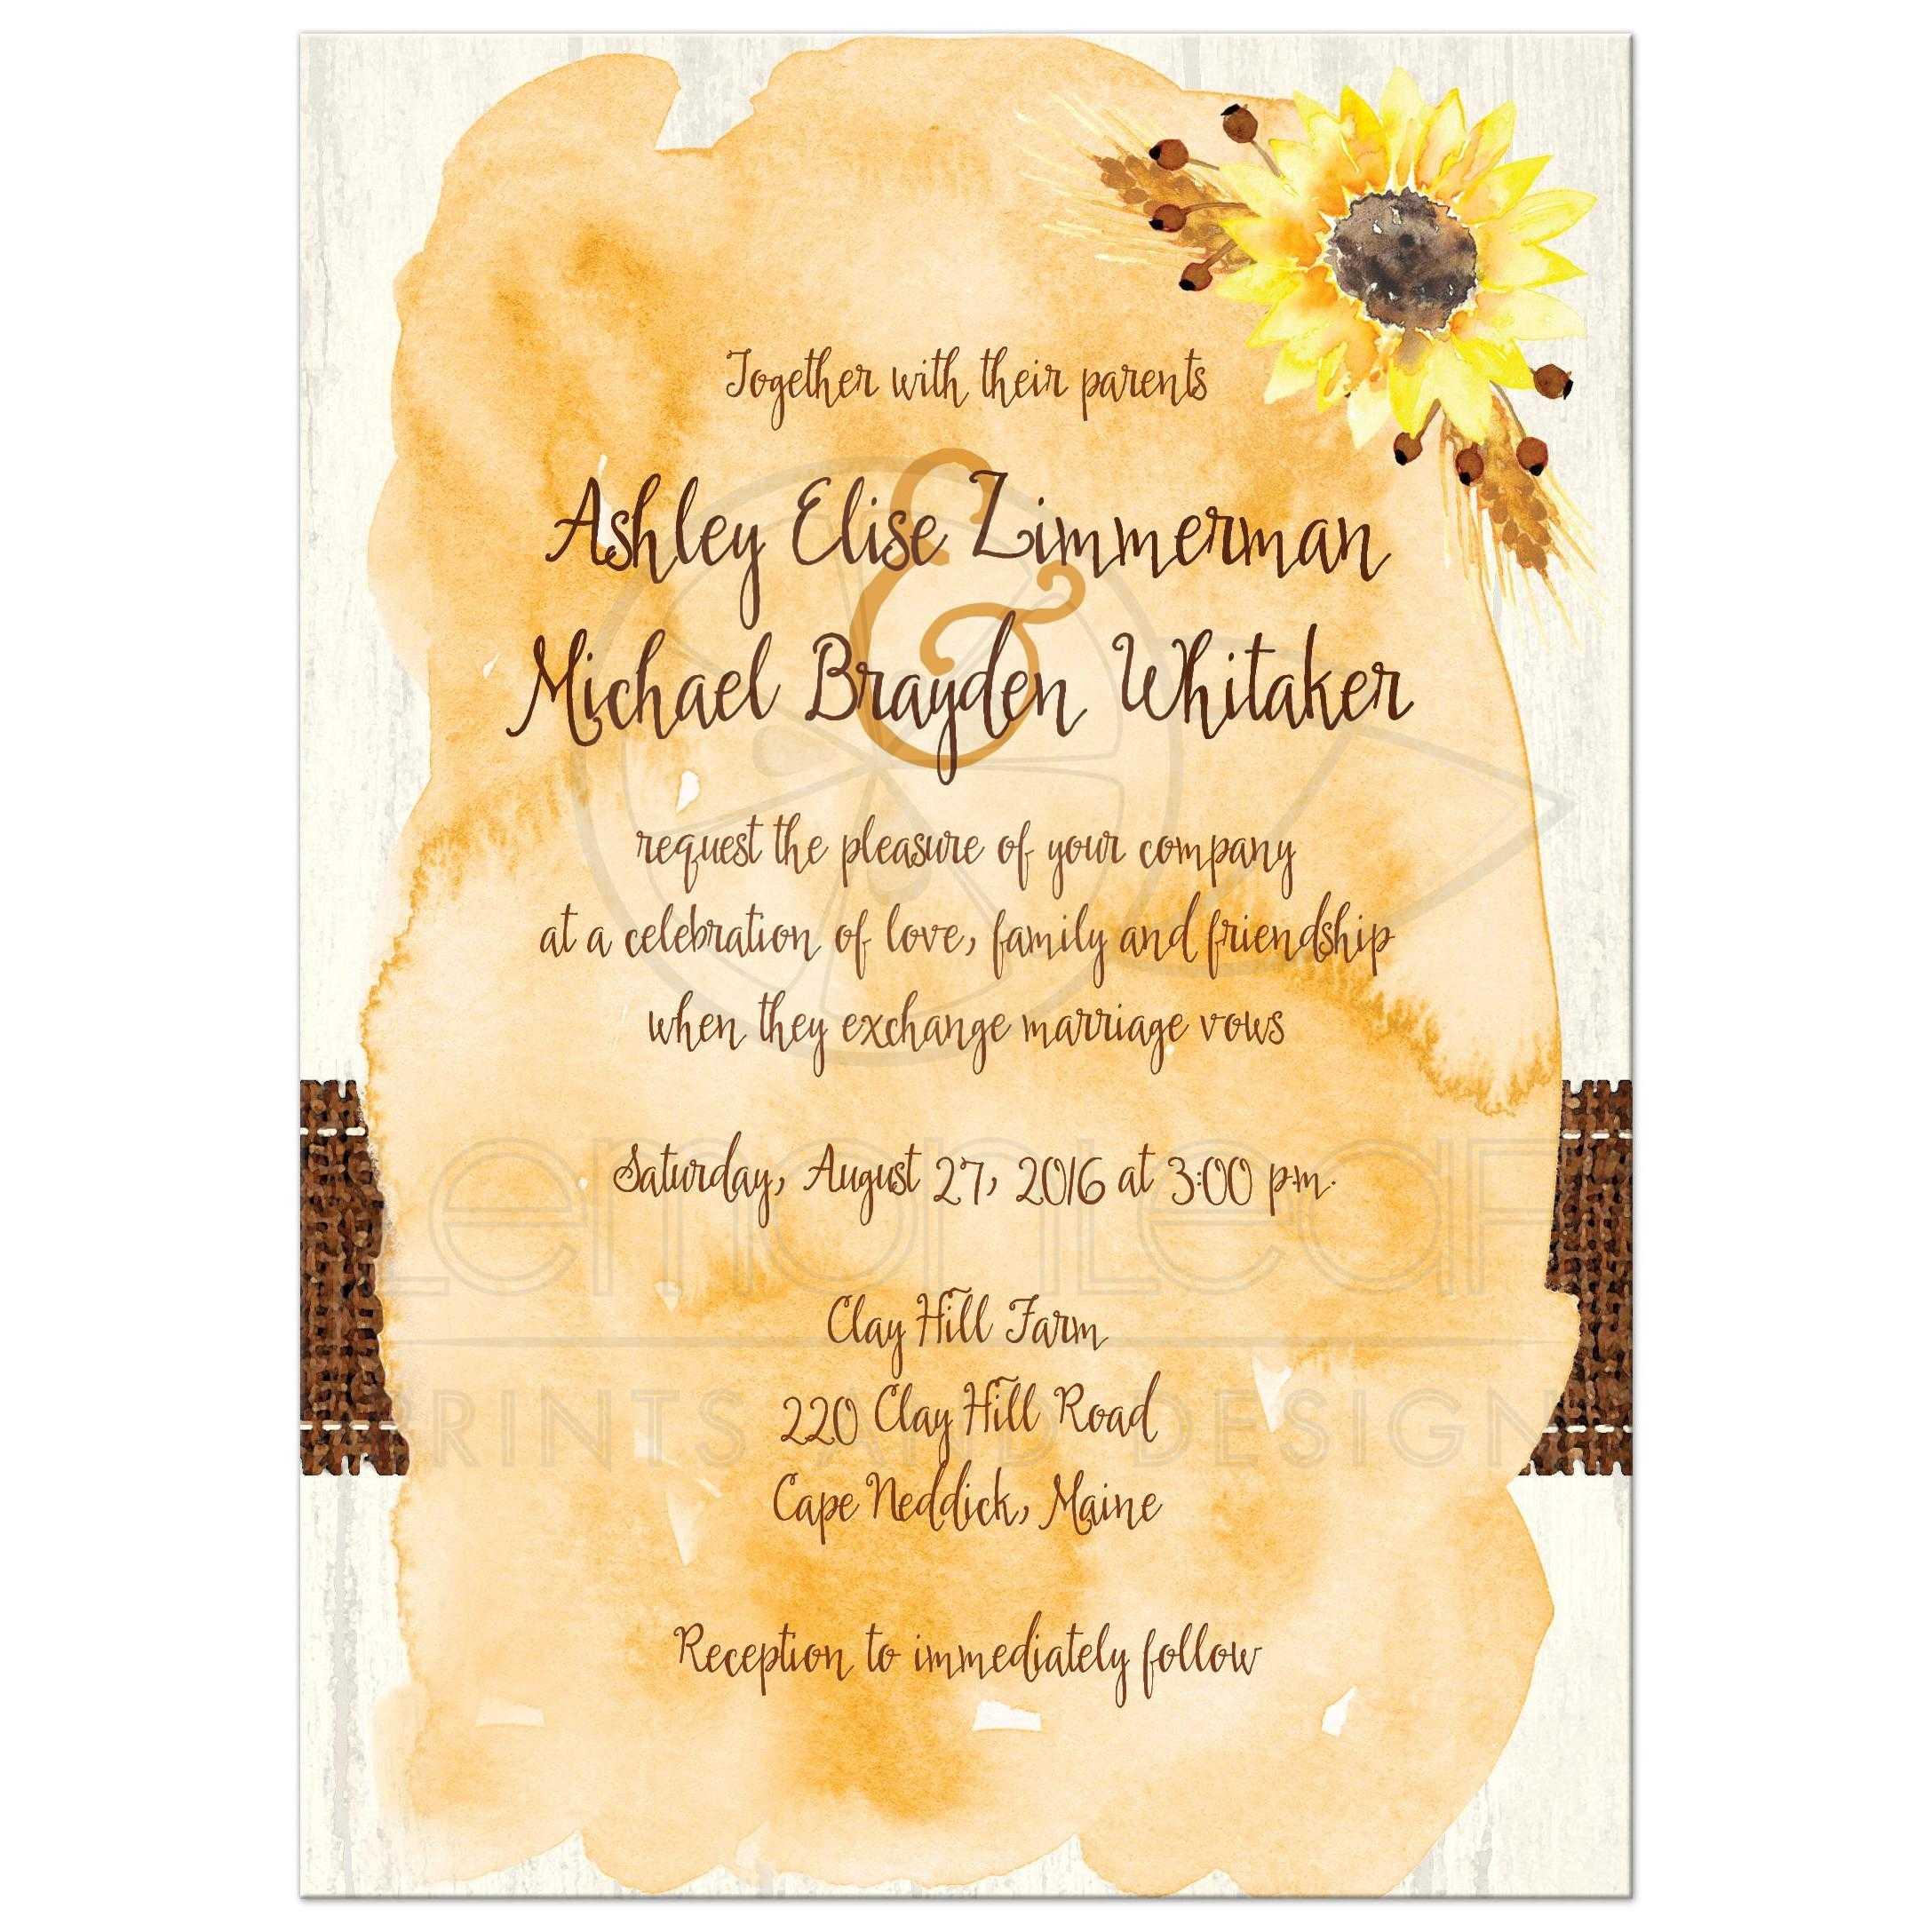 Rustic Wedding Invitation Watercolor Sunflowers Stitched Burlap